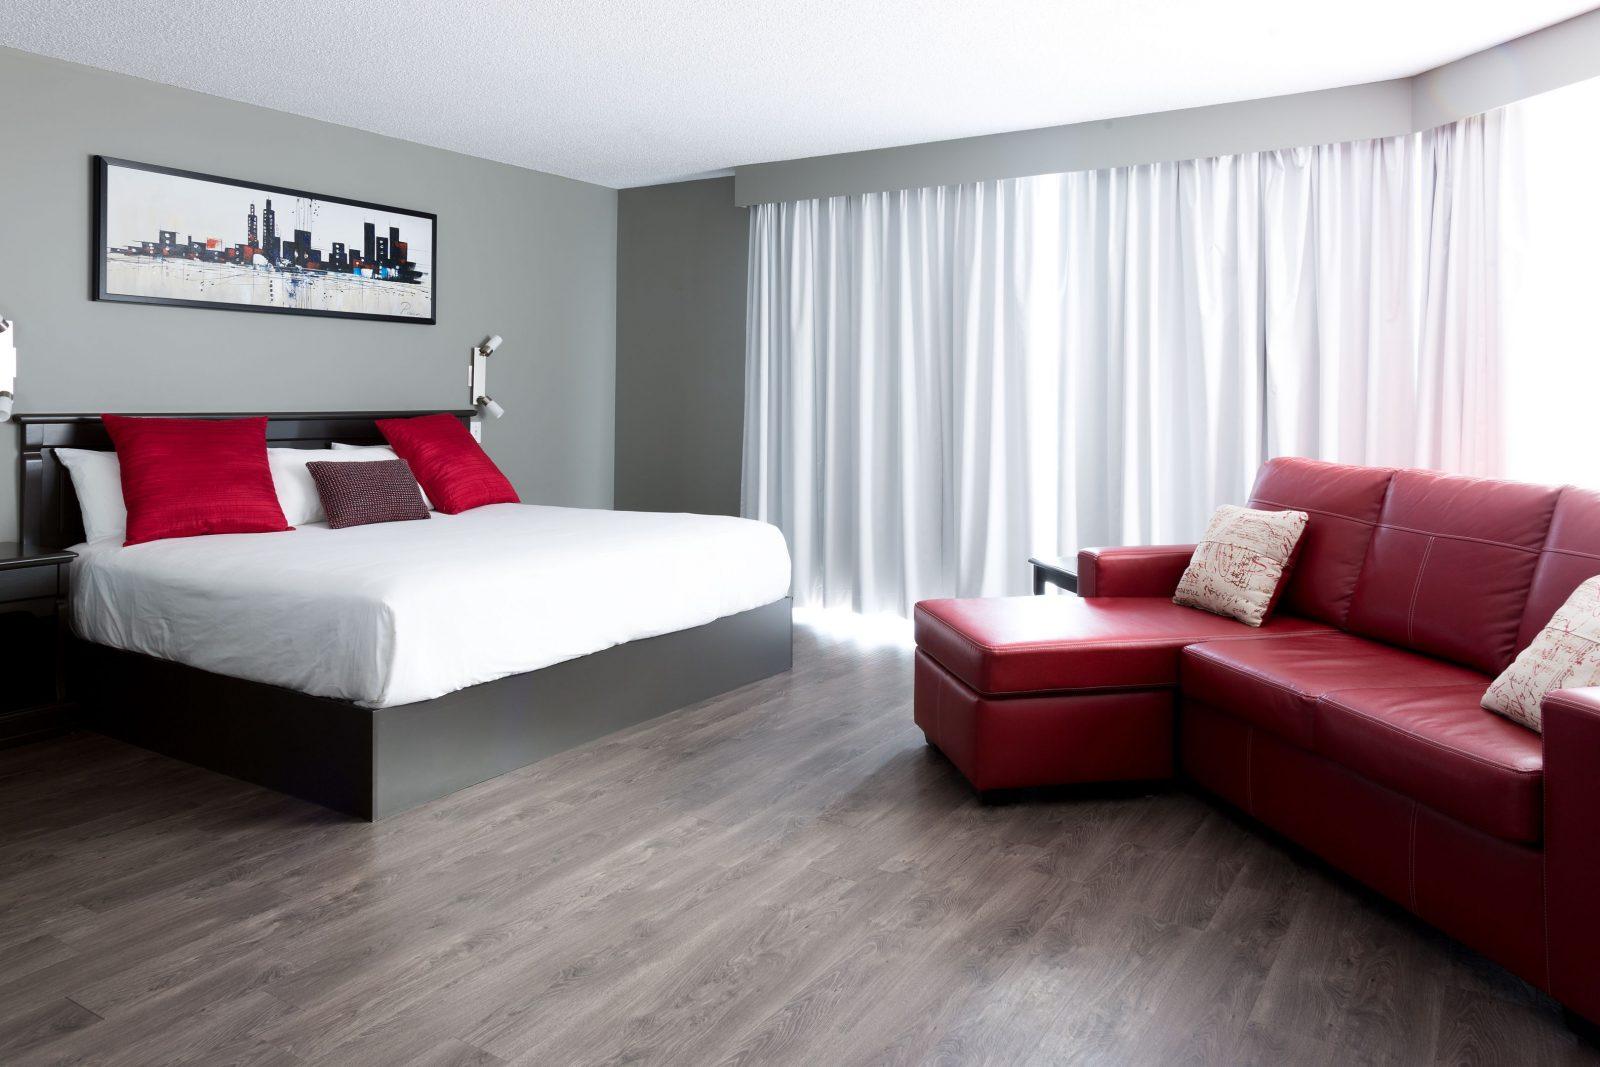 https://www.hoteluniversel.com/wp-content/uploads/2020/07/2Q7A6079-Copie-1600x1067.jpg